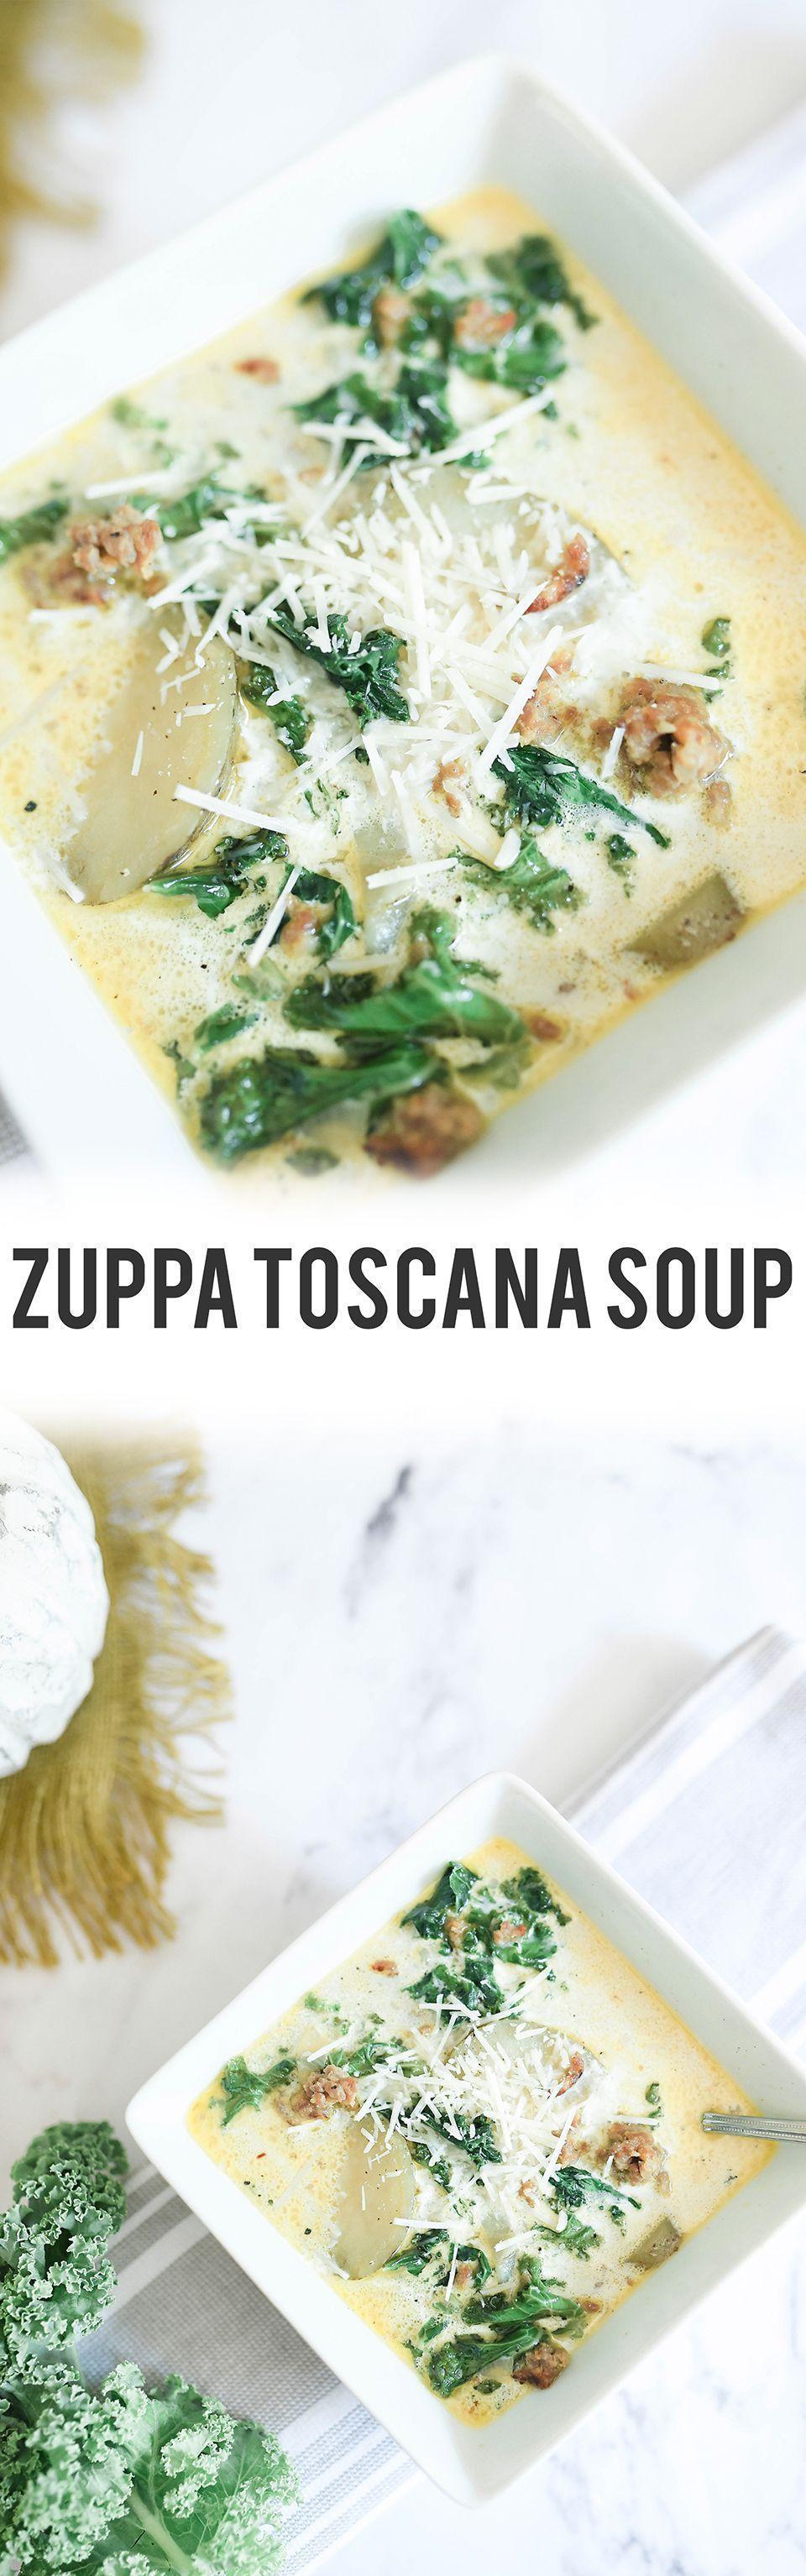 Zuppa Toscana Soup #zuppatoscanasoup Zuppa Toscana Soup Recipe | Olive Garden Co...#garden #olive #recipe #soup #toscana #zuppa #zuppatoscanasoup #zuppatoscanasoup